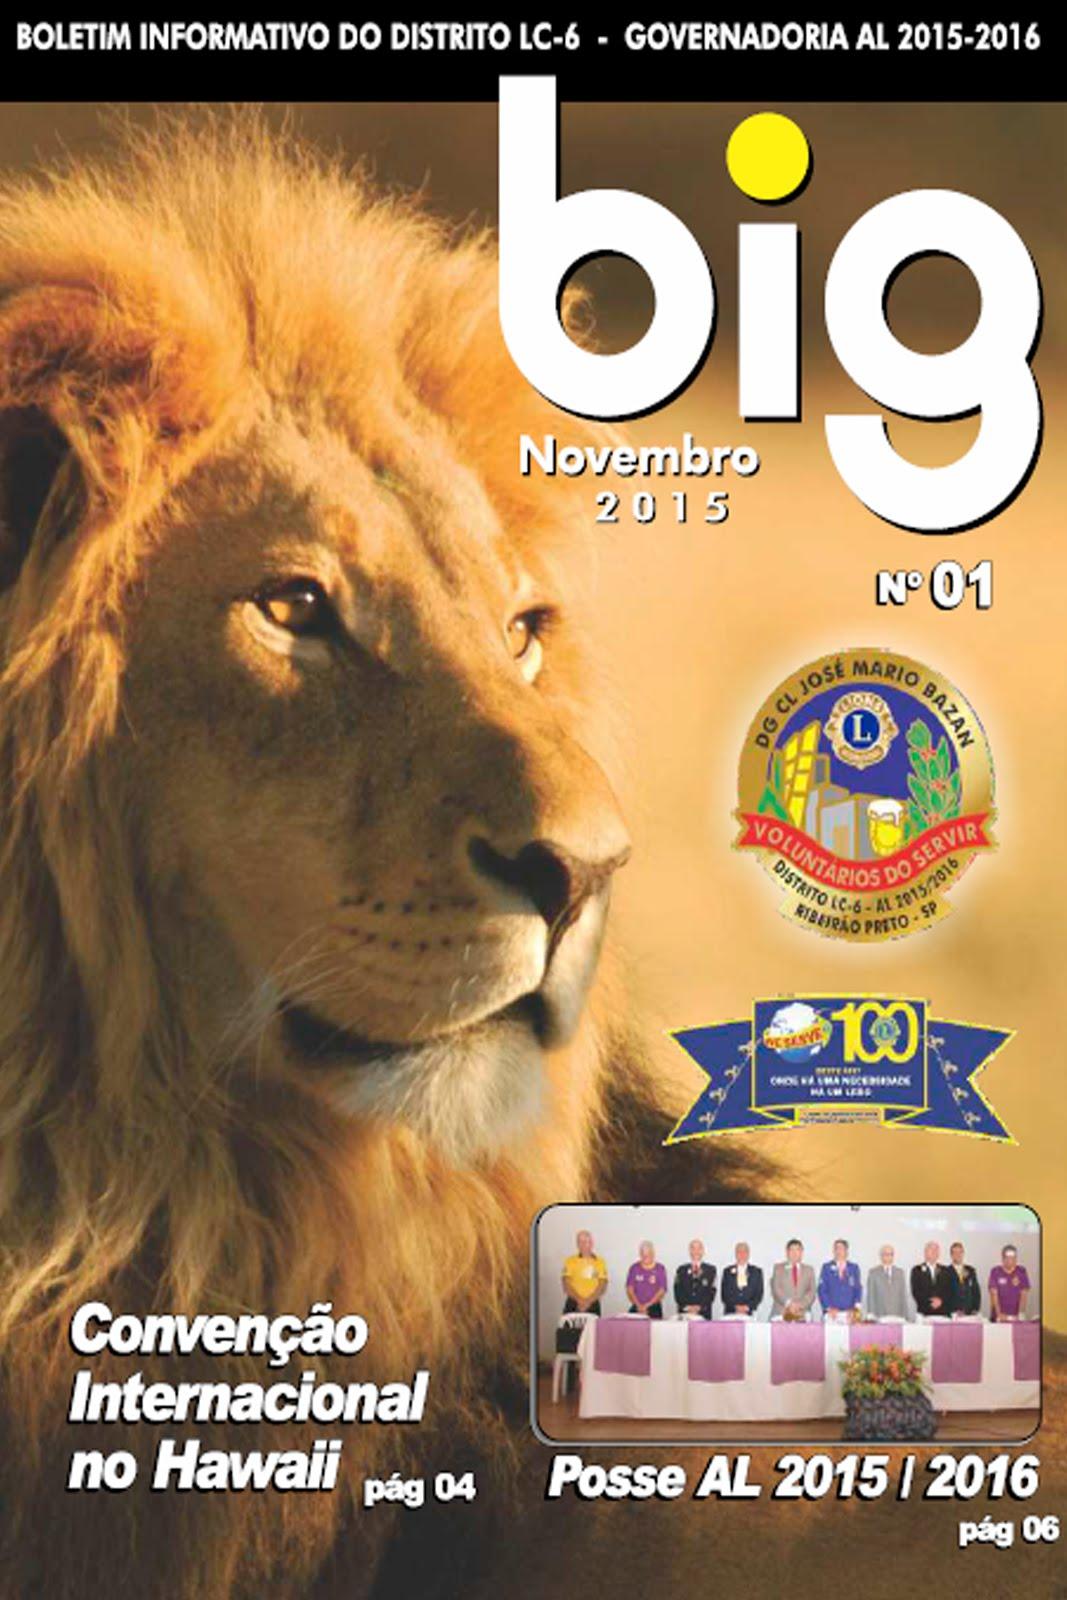 BIG - NOVEMBRO 2015